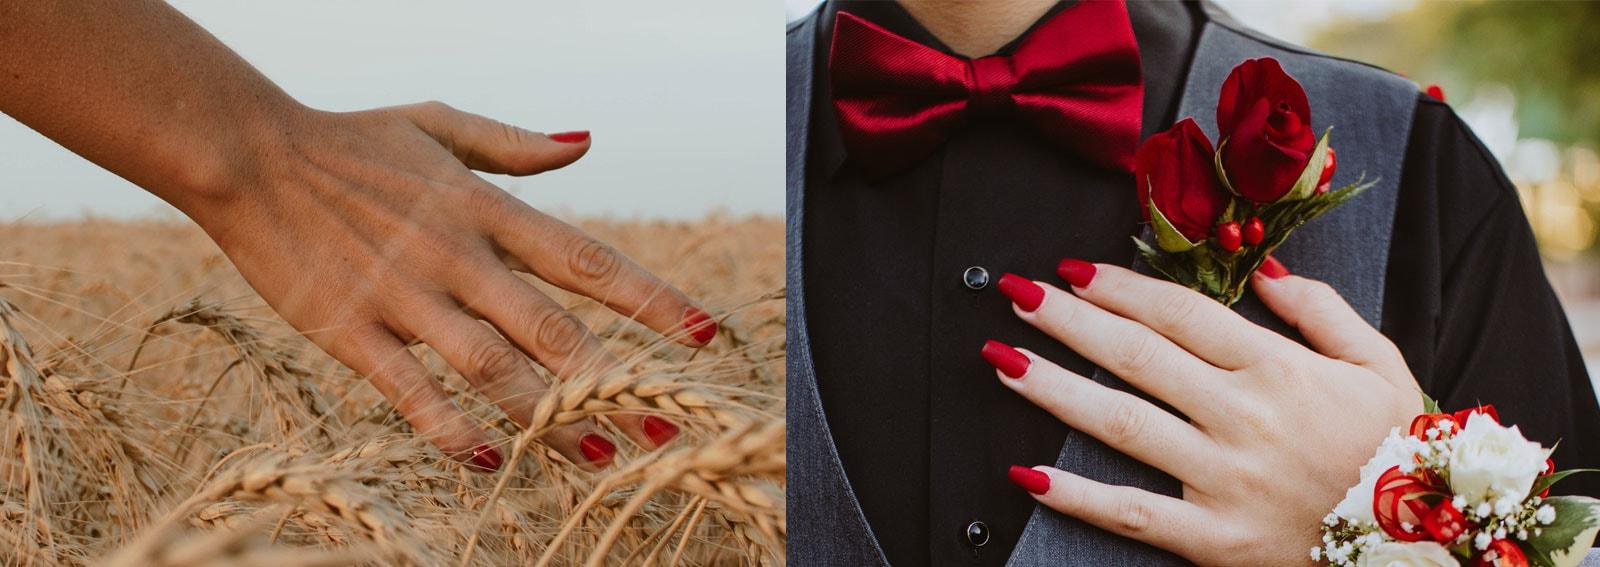 unghie-gel-rosse-nail-art-manicure-cover-desktop-01